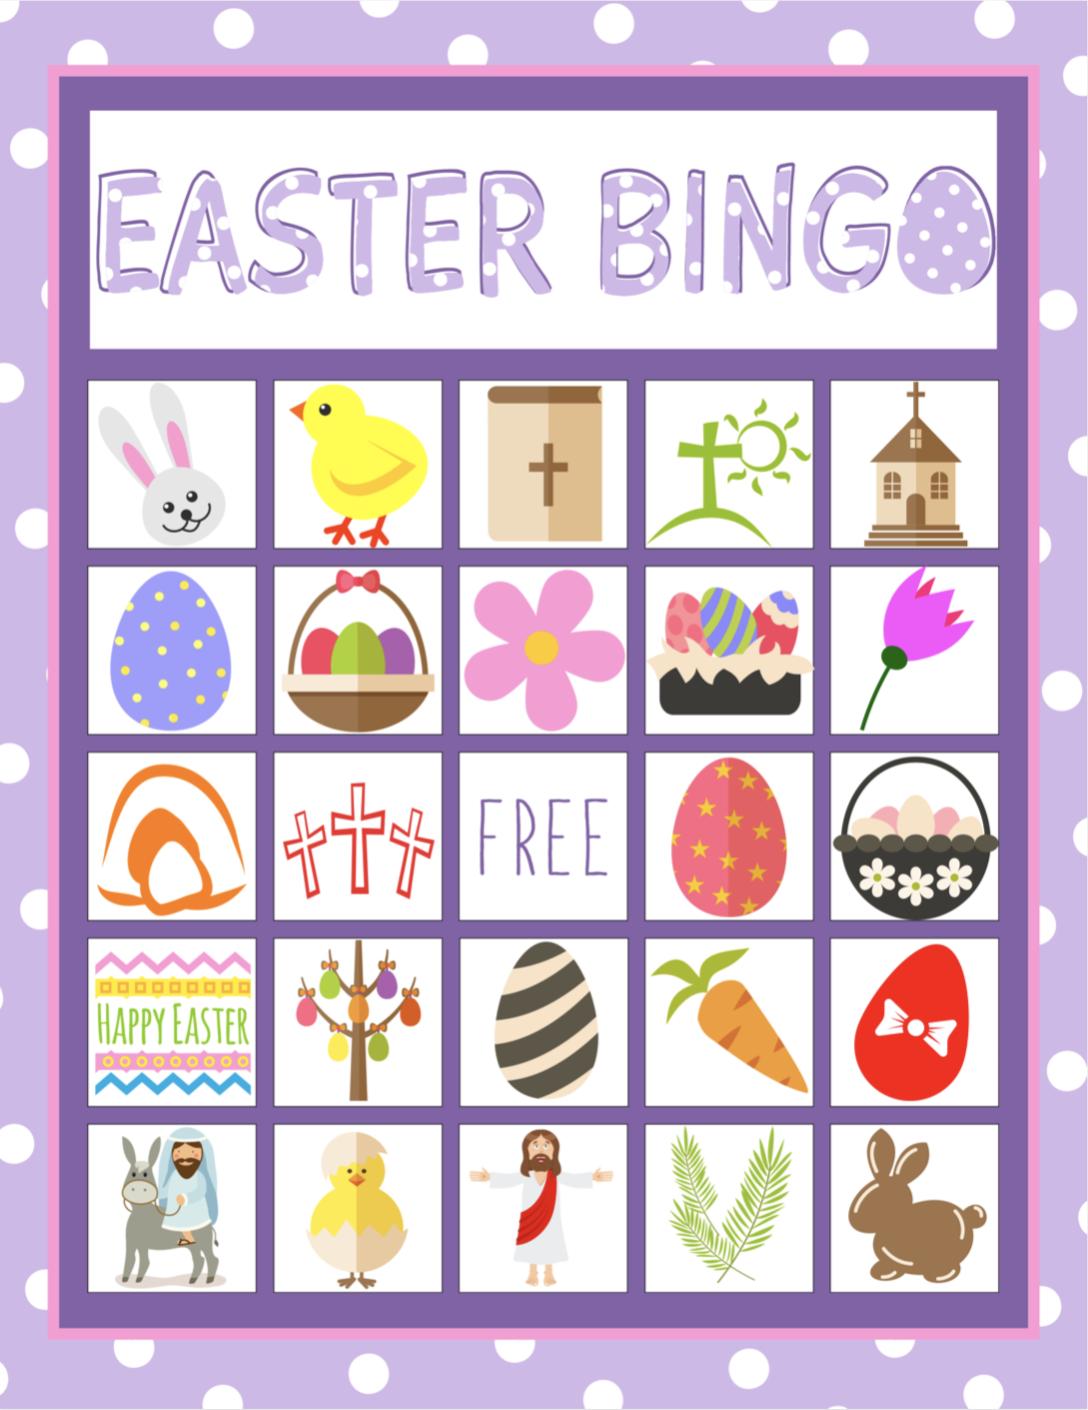 Easter Bingo Game For Kids | Bingo Games For Kids, Easter